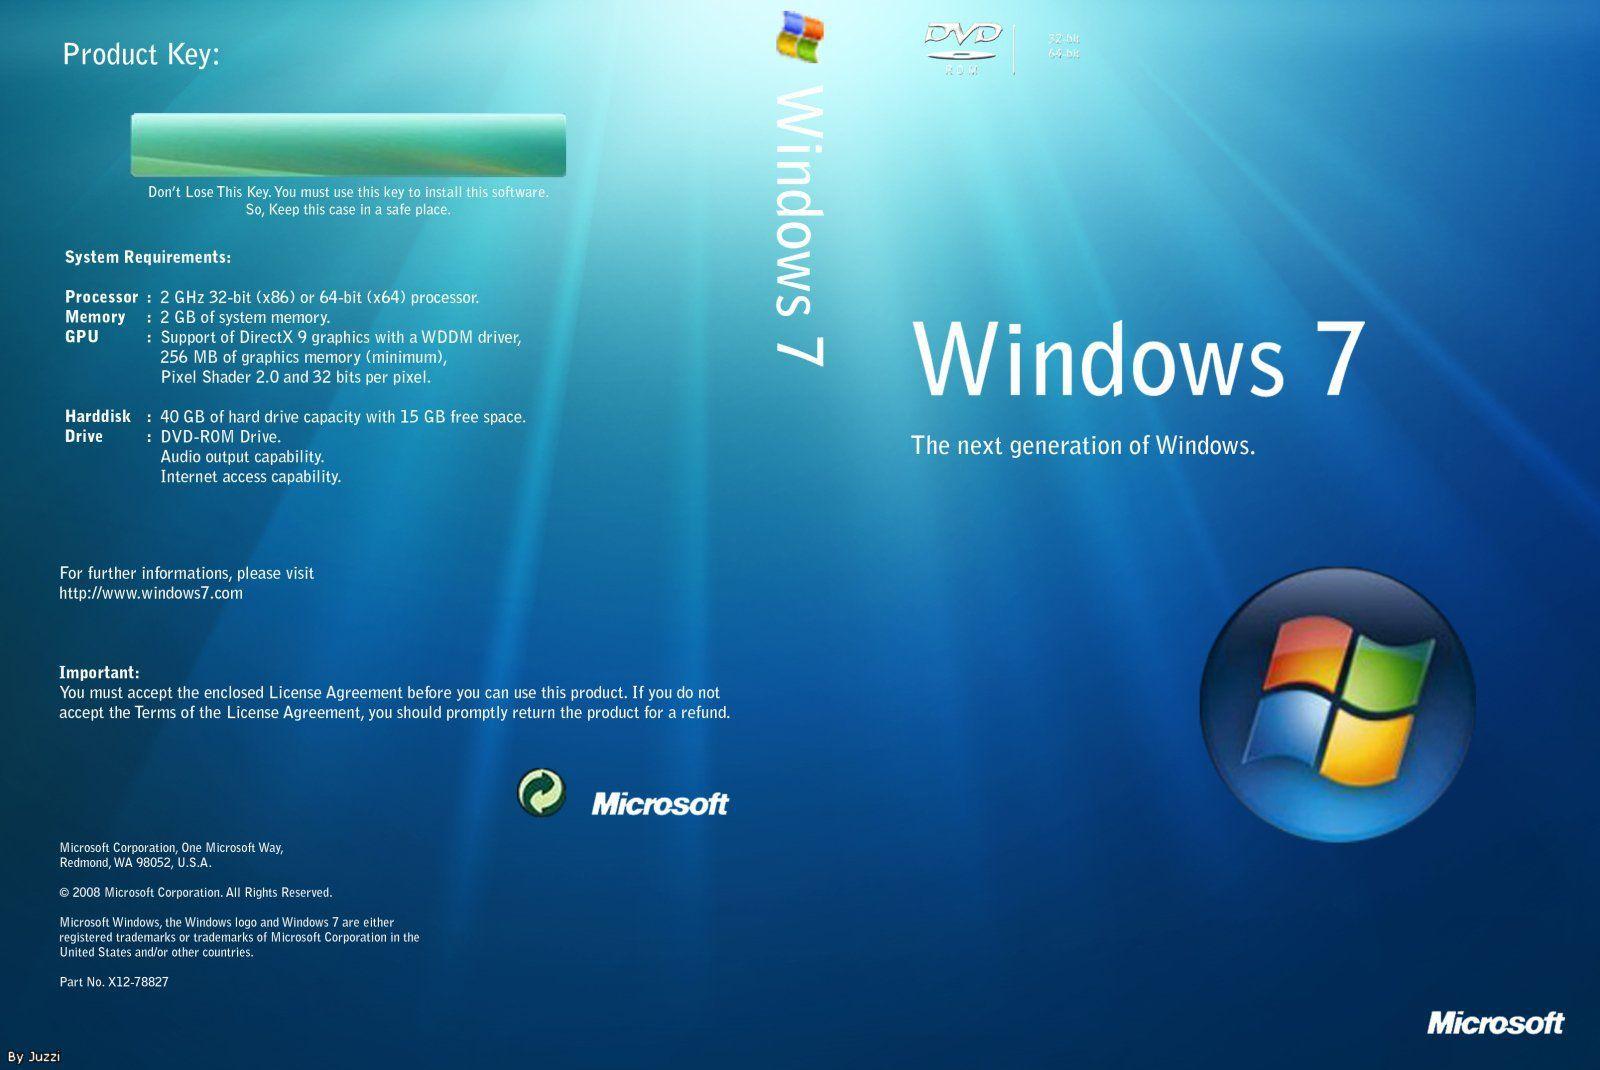 Жизнь лекции по microsoft office 2010 free download full version for windows 7 crack радиопередачи лекции